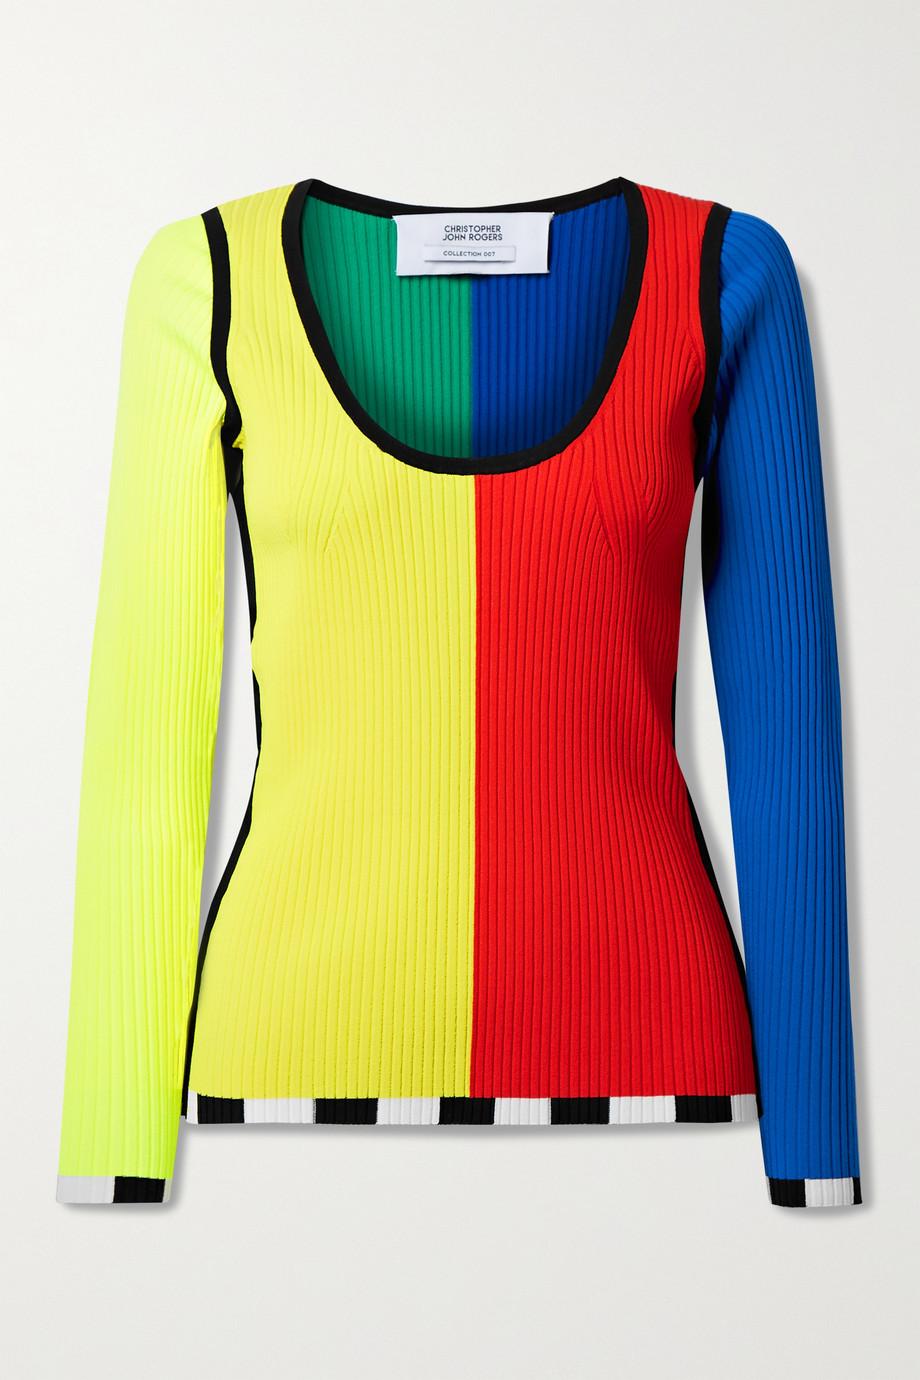 Christopher John Rogers Rippstrickpullover in Colour-Block-Optik